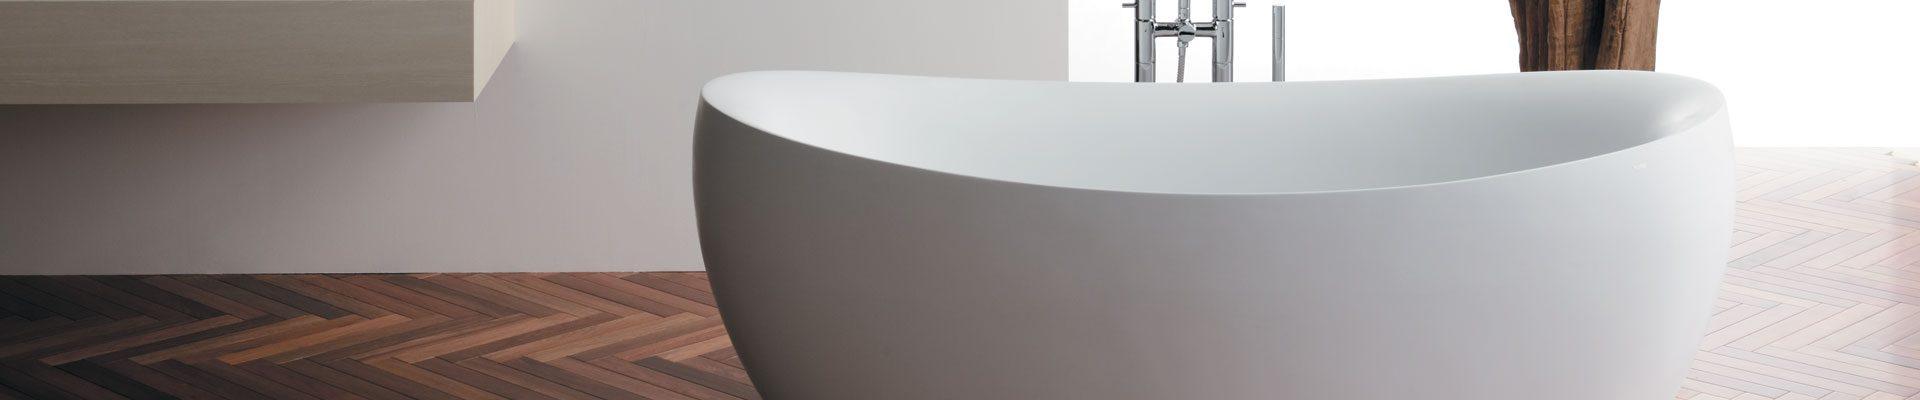 Bồn tắm nhựa FRP cao cấp